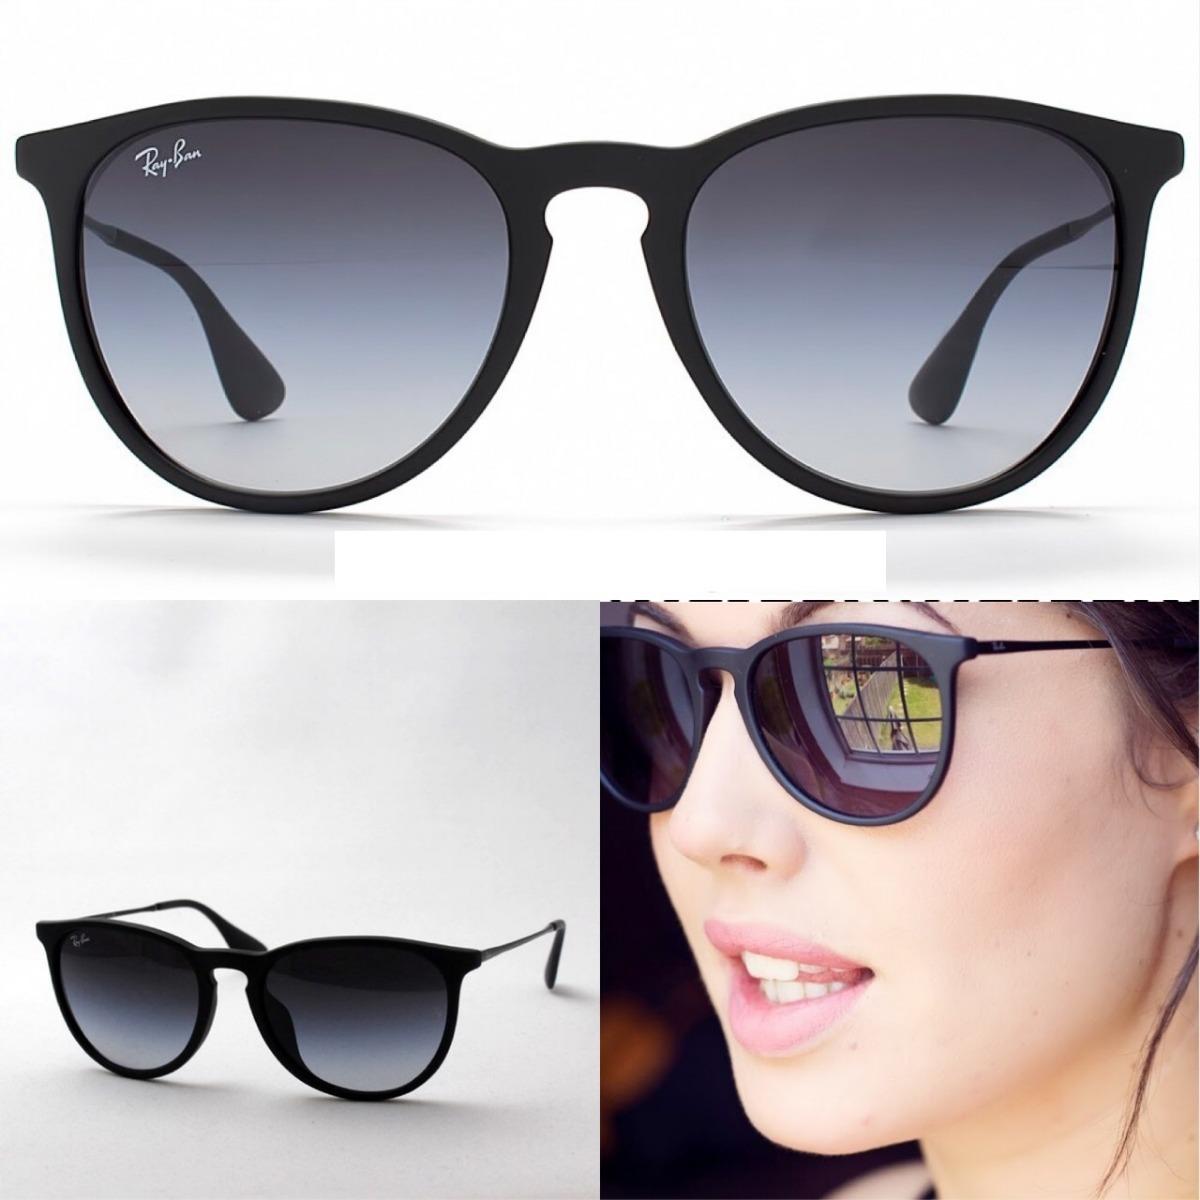 49eecb8e76aa1 Oculos De Sol Ray Ban Erika Rb4171 Feminino - R  269,49 em Mercado Livre